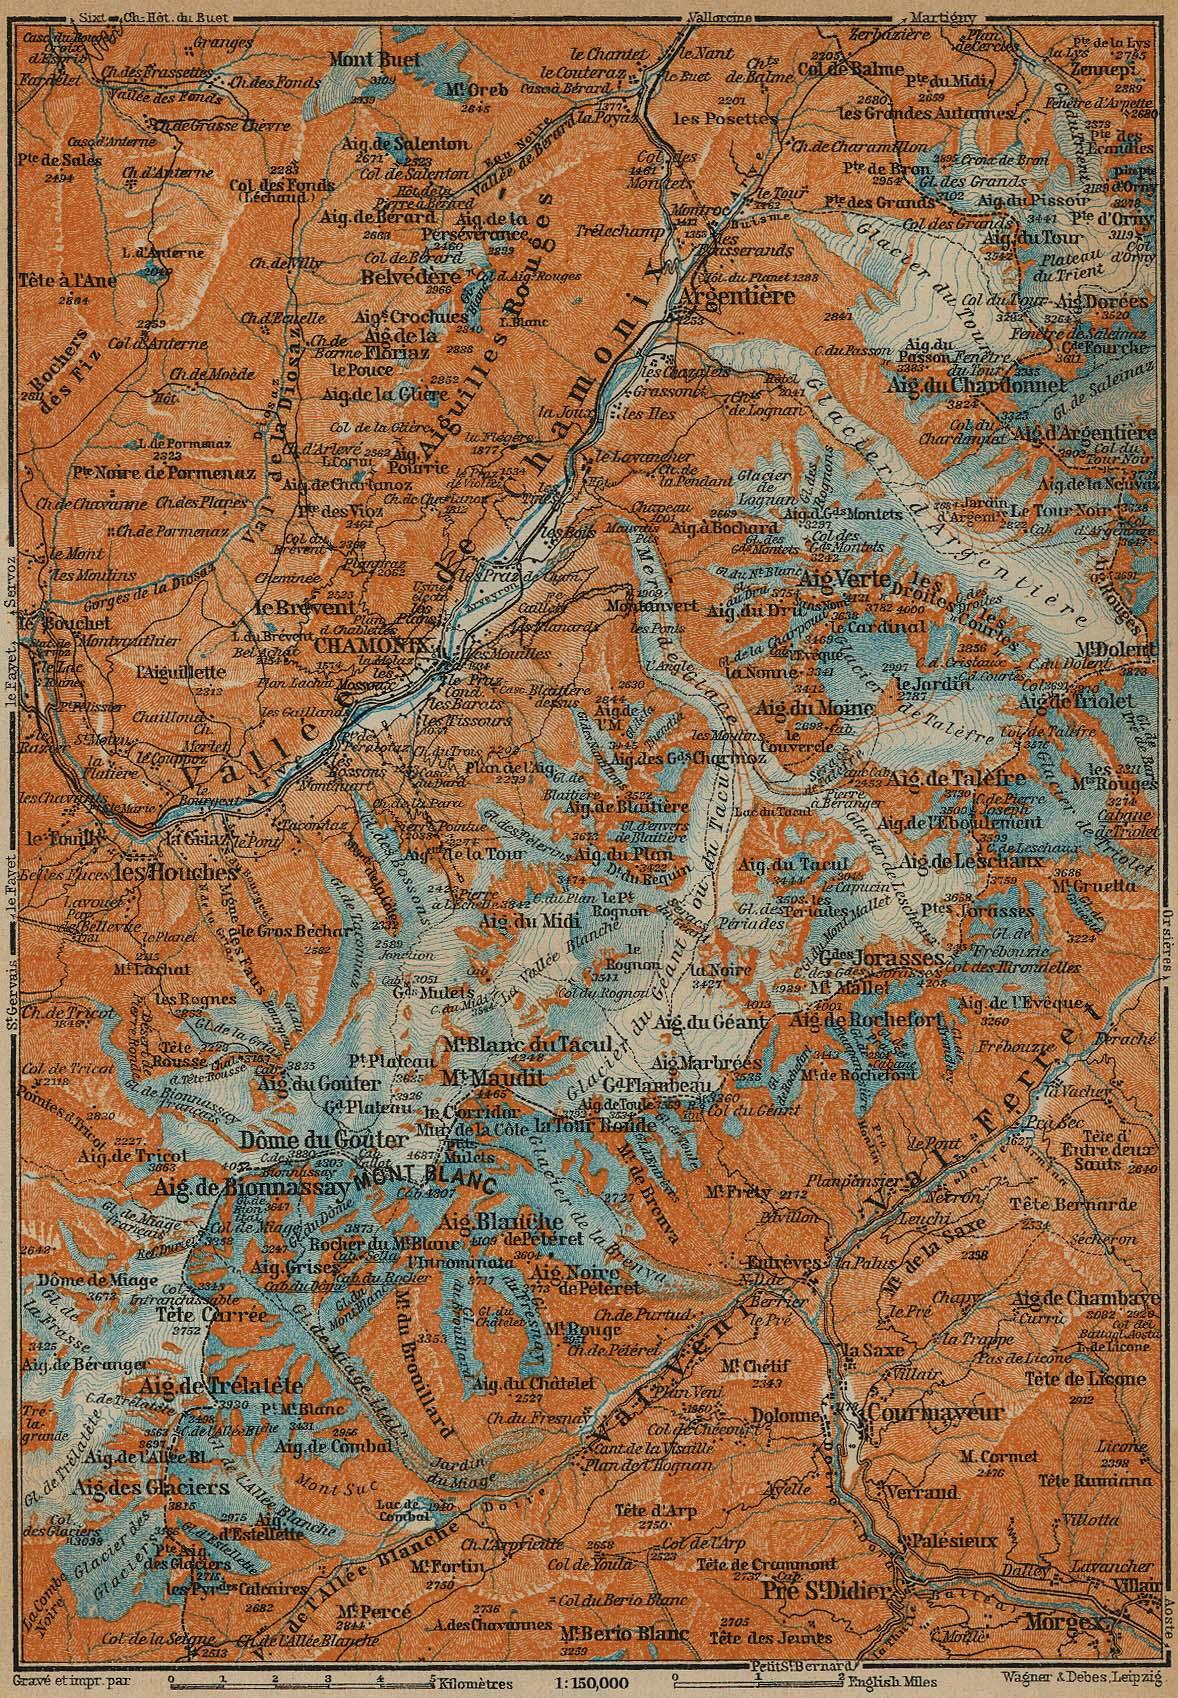 Mapa del Mont-Blanc, Francia - Italia 1914